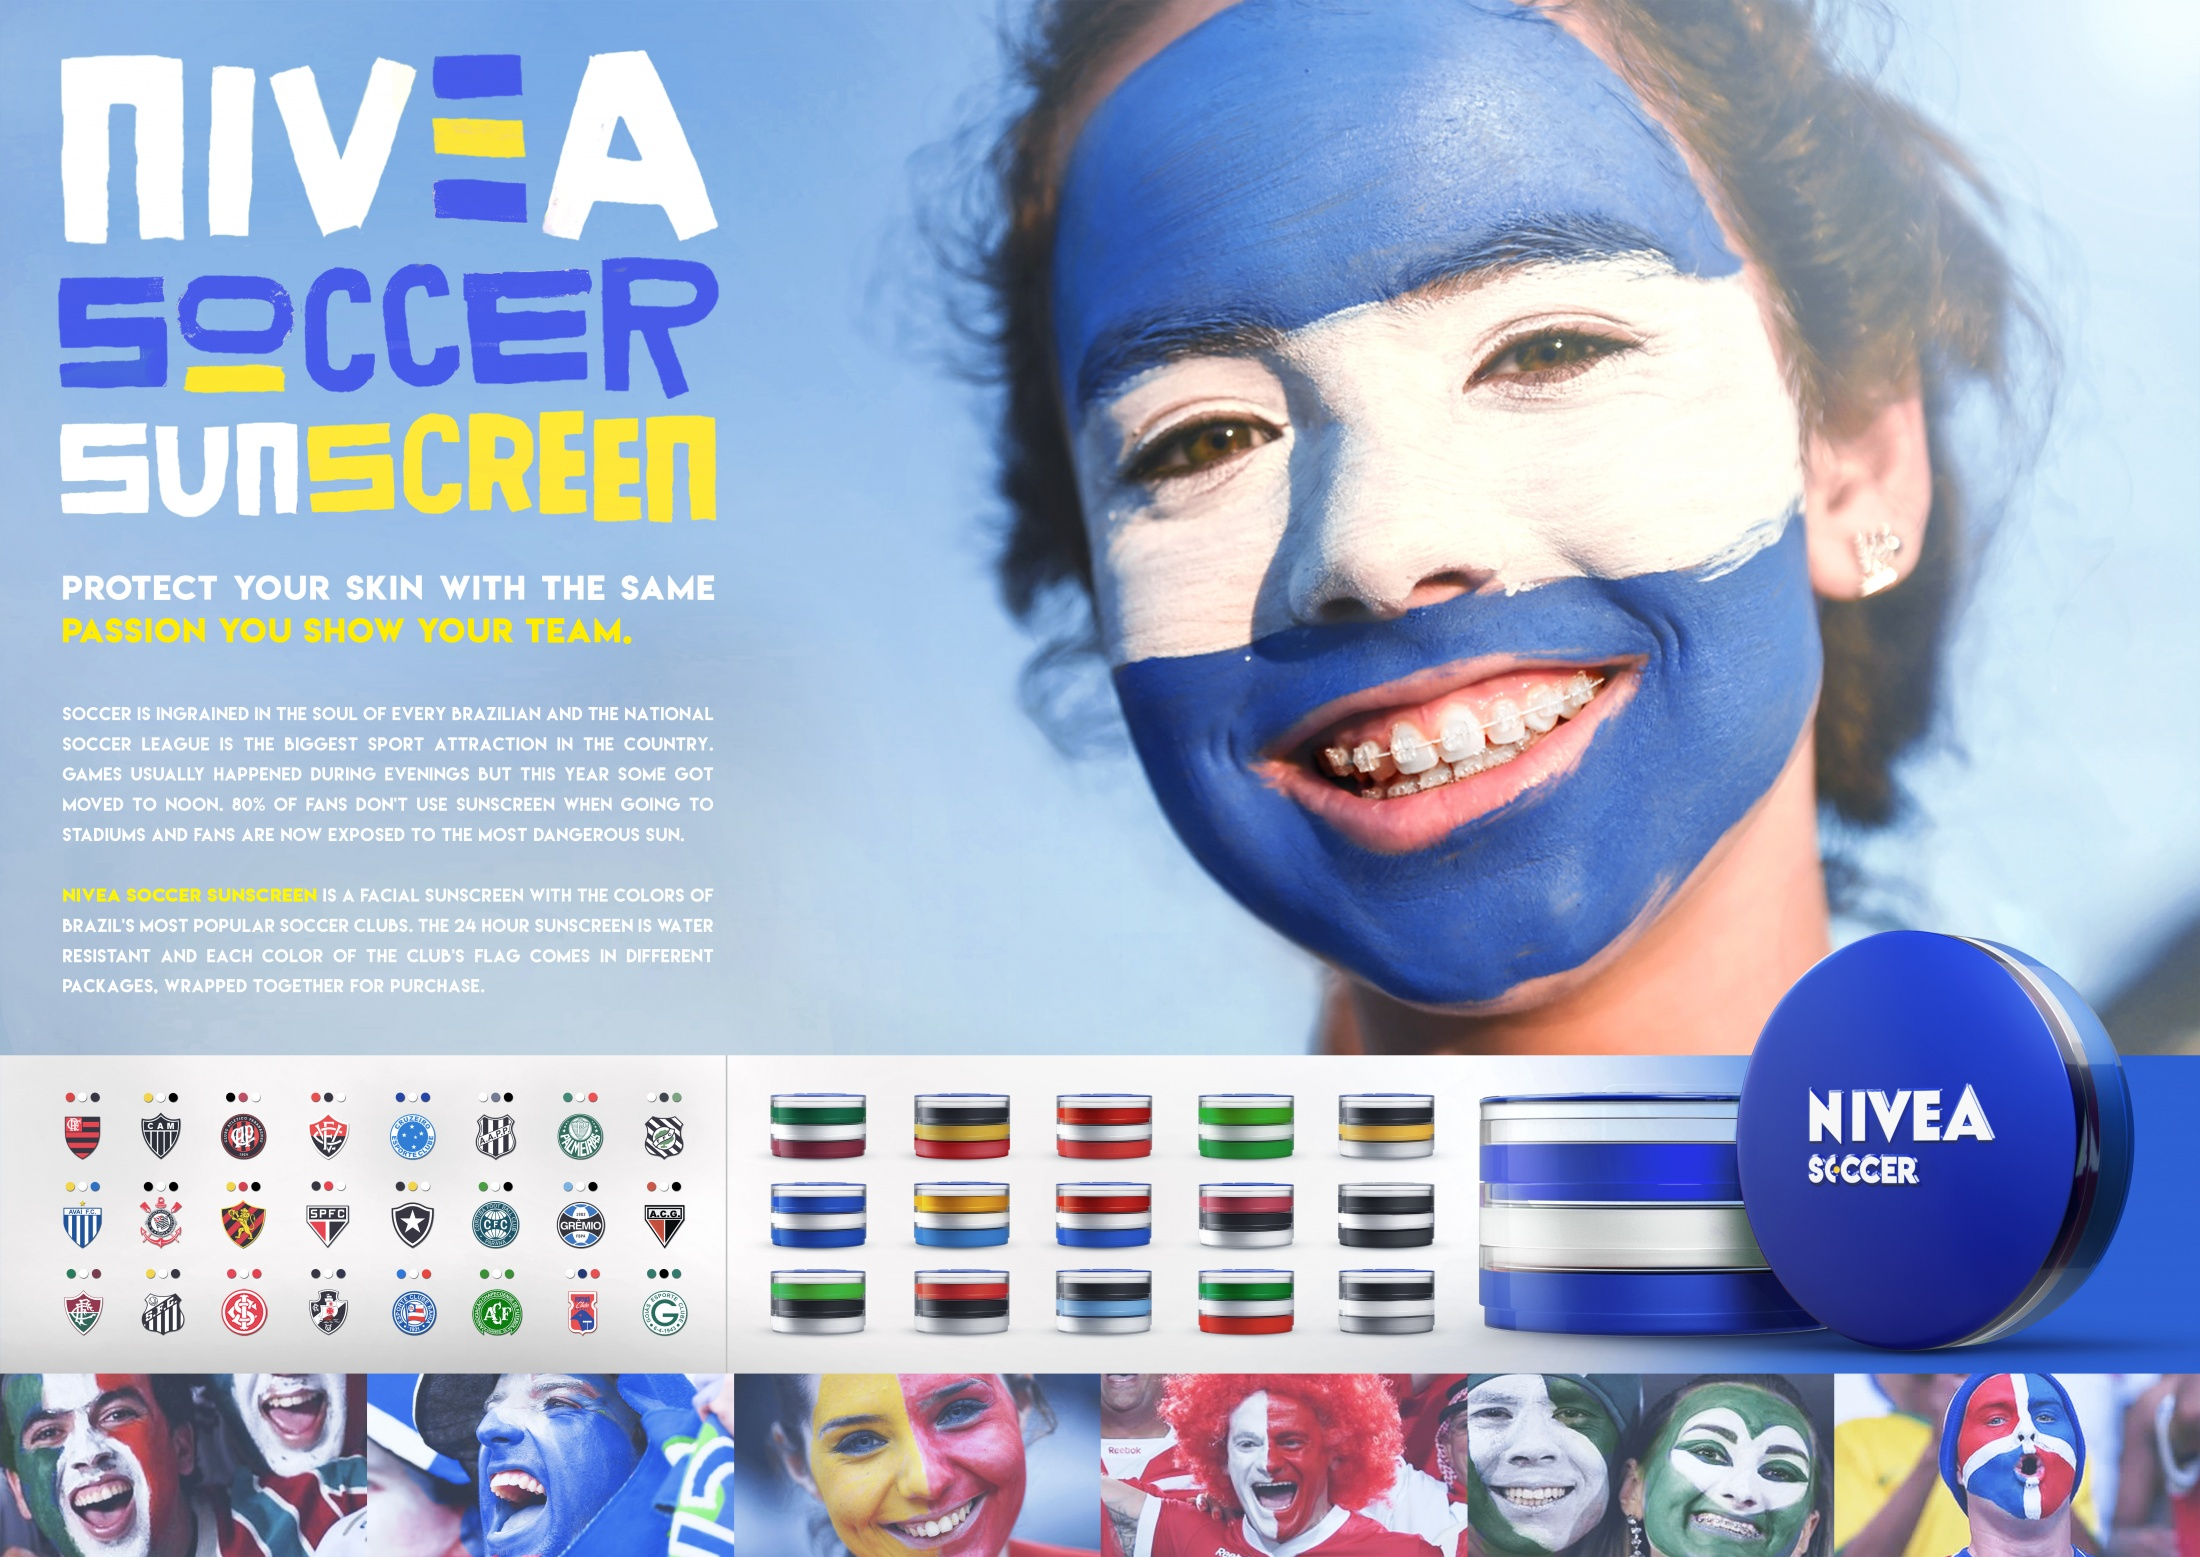 Thumbnail for Nivea Soccer Sunscreen